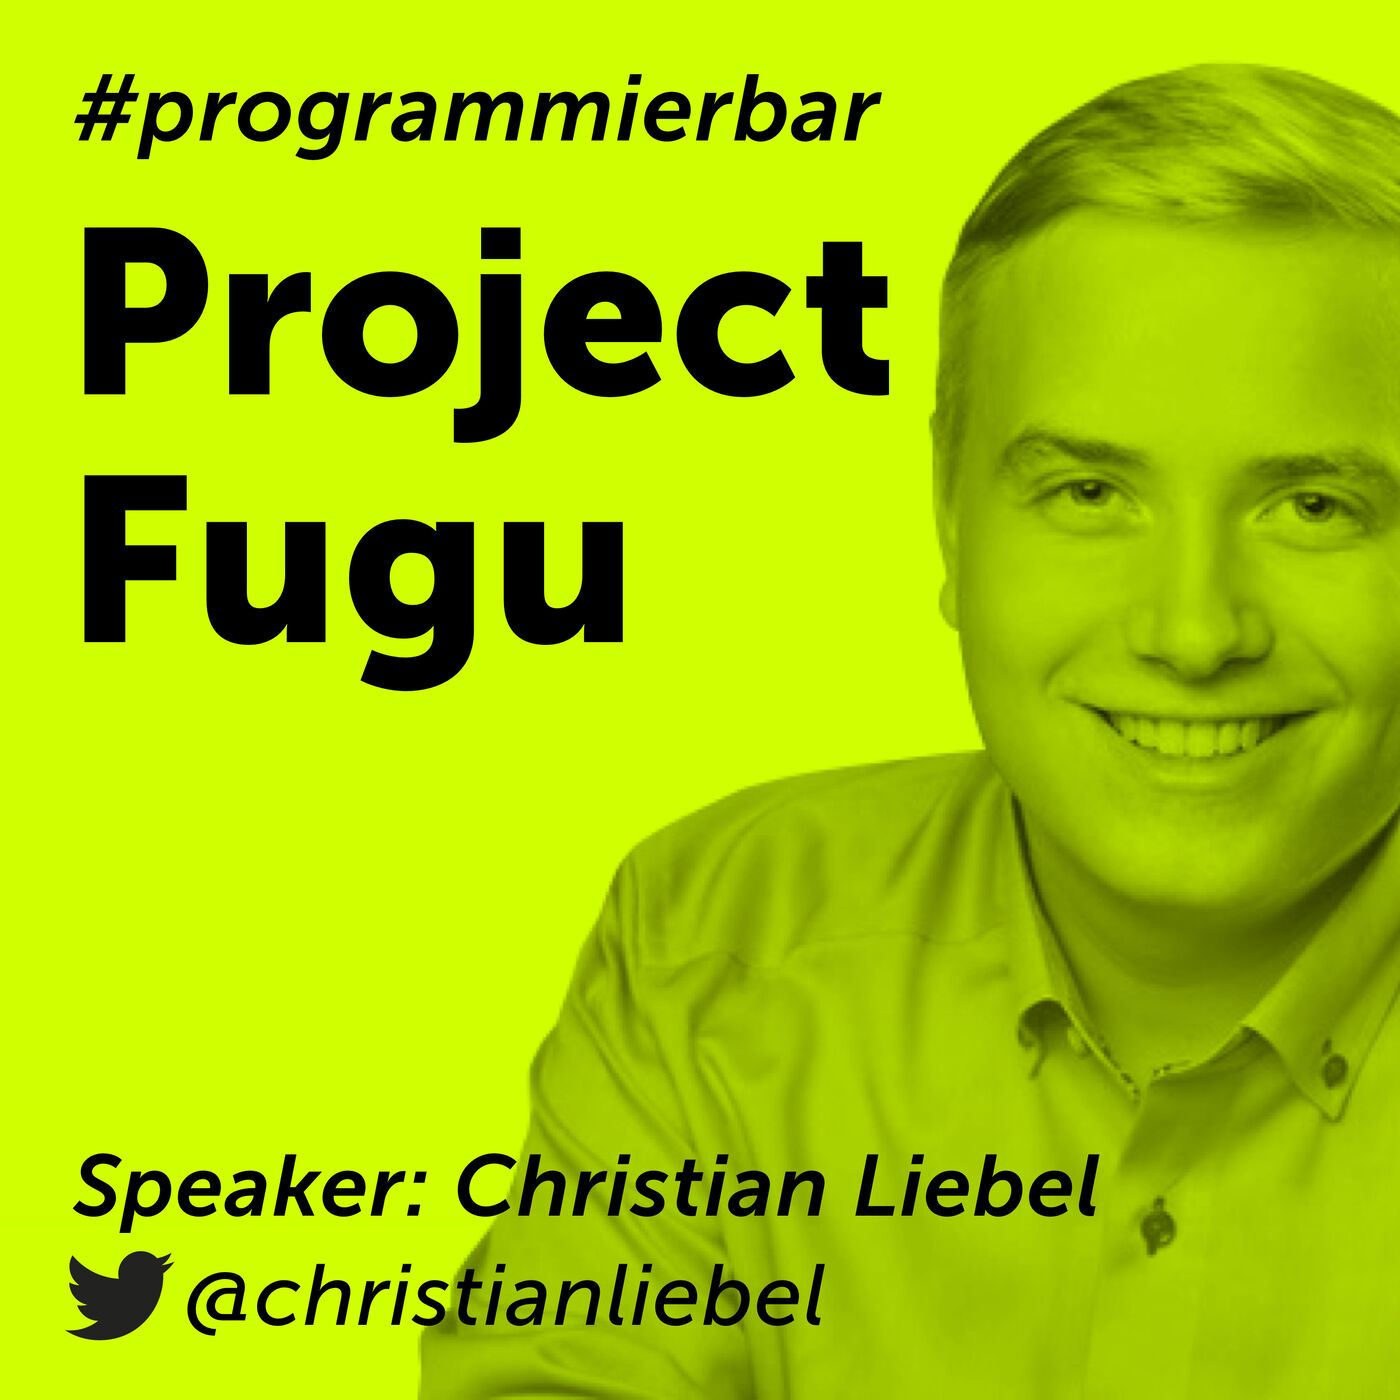 Folge 72 - Project Fugu mit Christian Liebel von Thinktecture